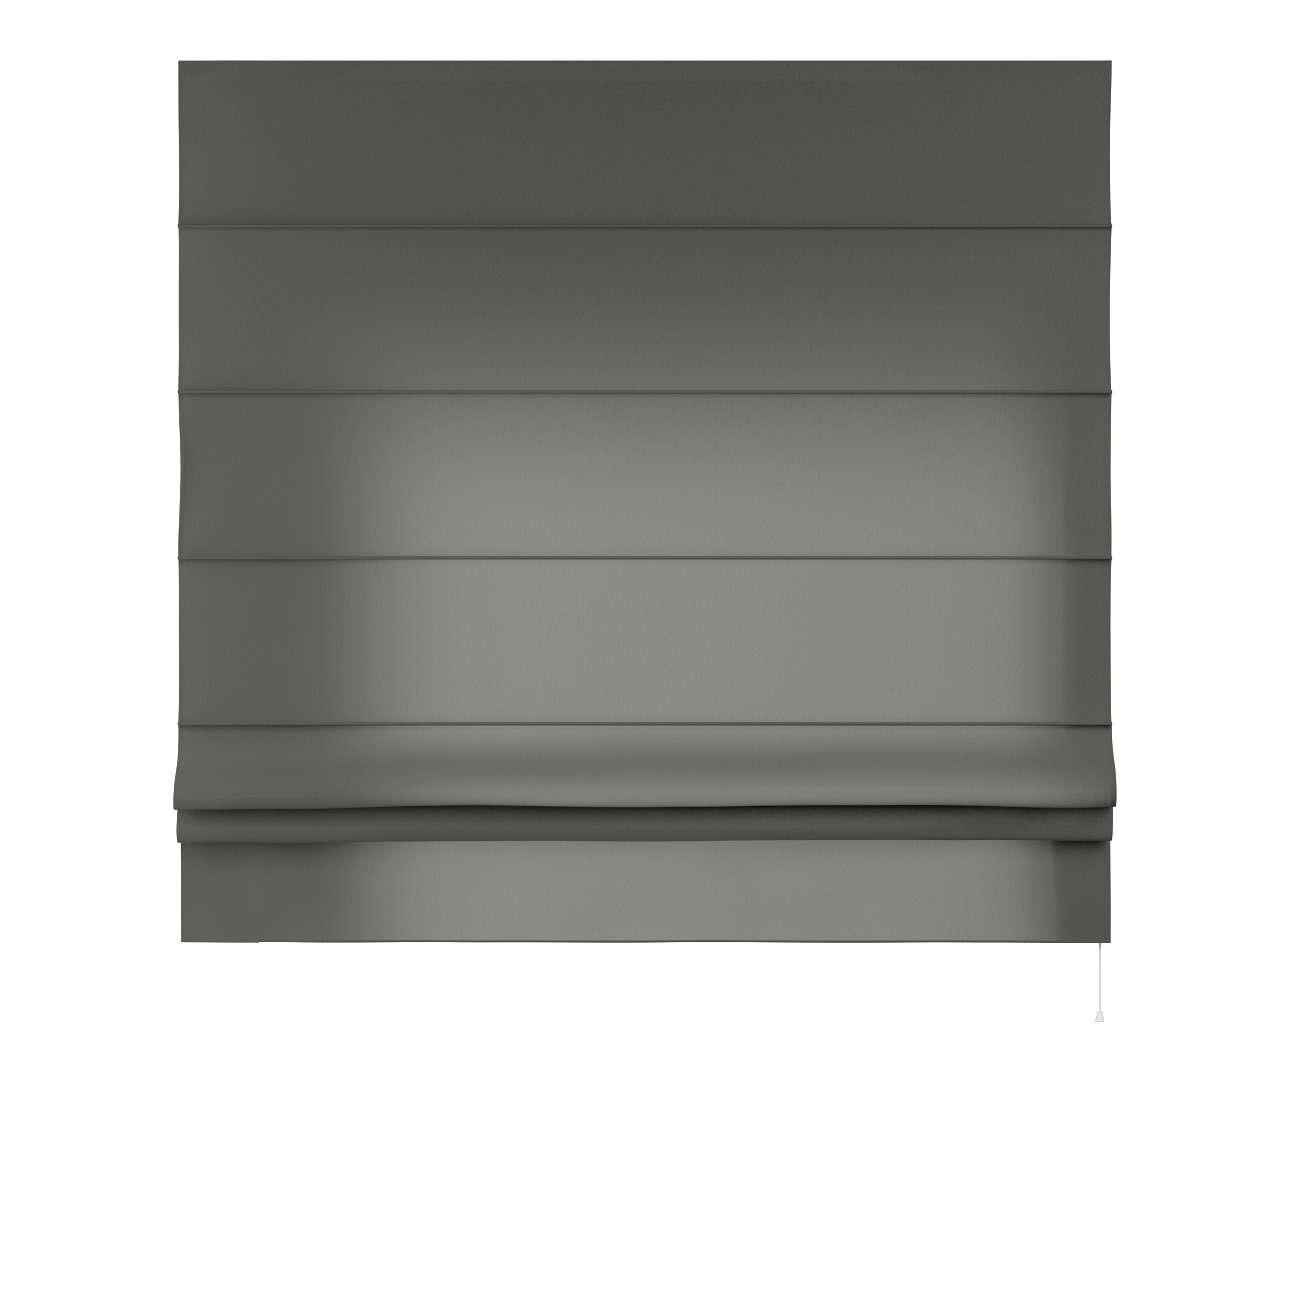 Raffrollo Padva 80 x 170 cm von der Kollektion Quadro, Stoff: 136-14